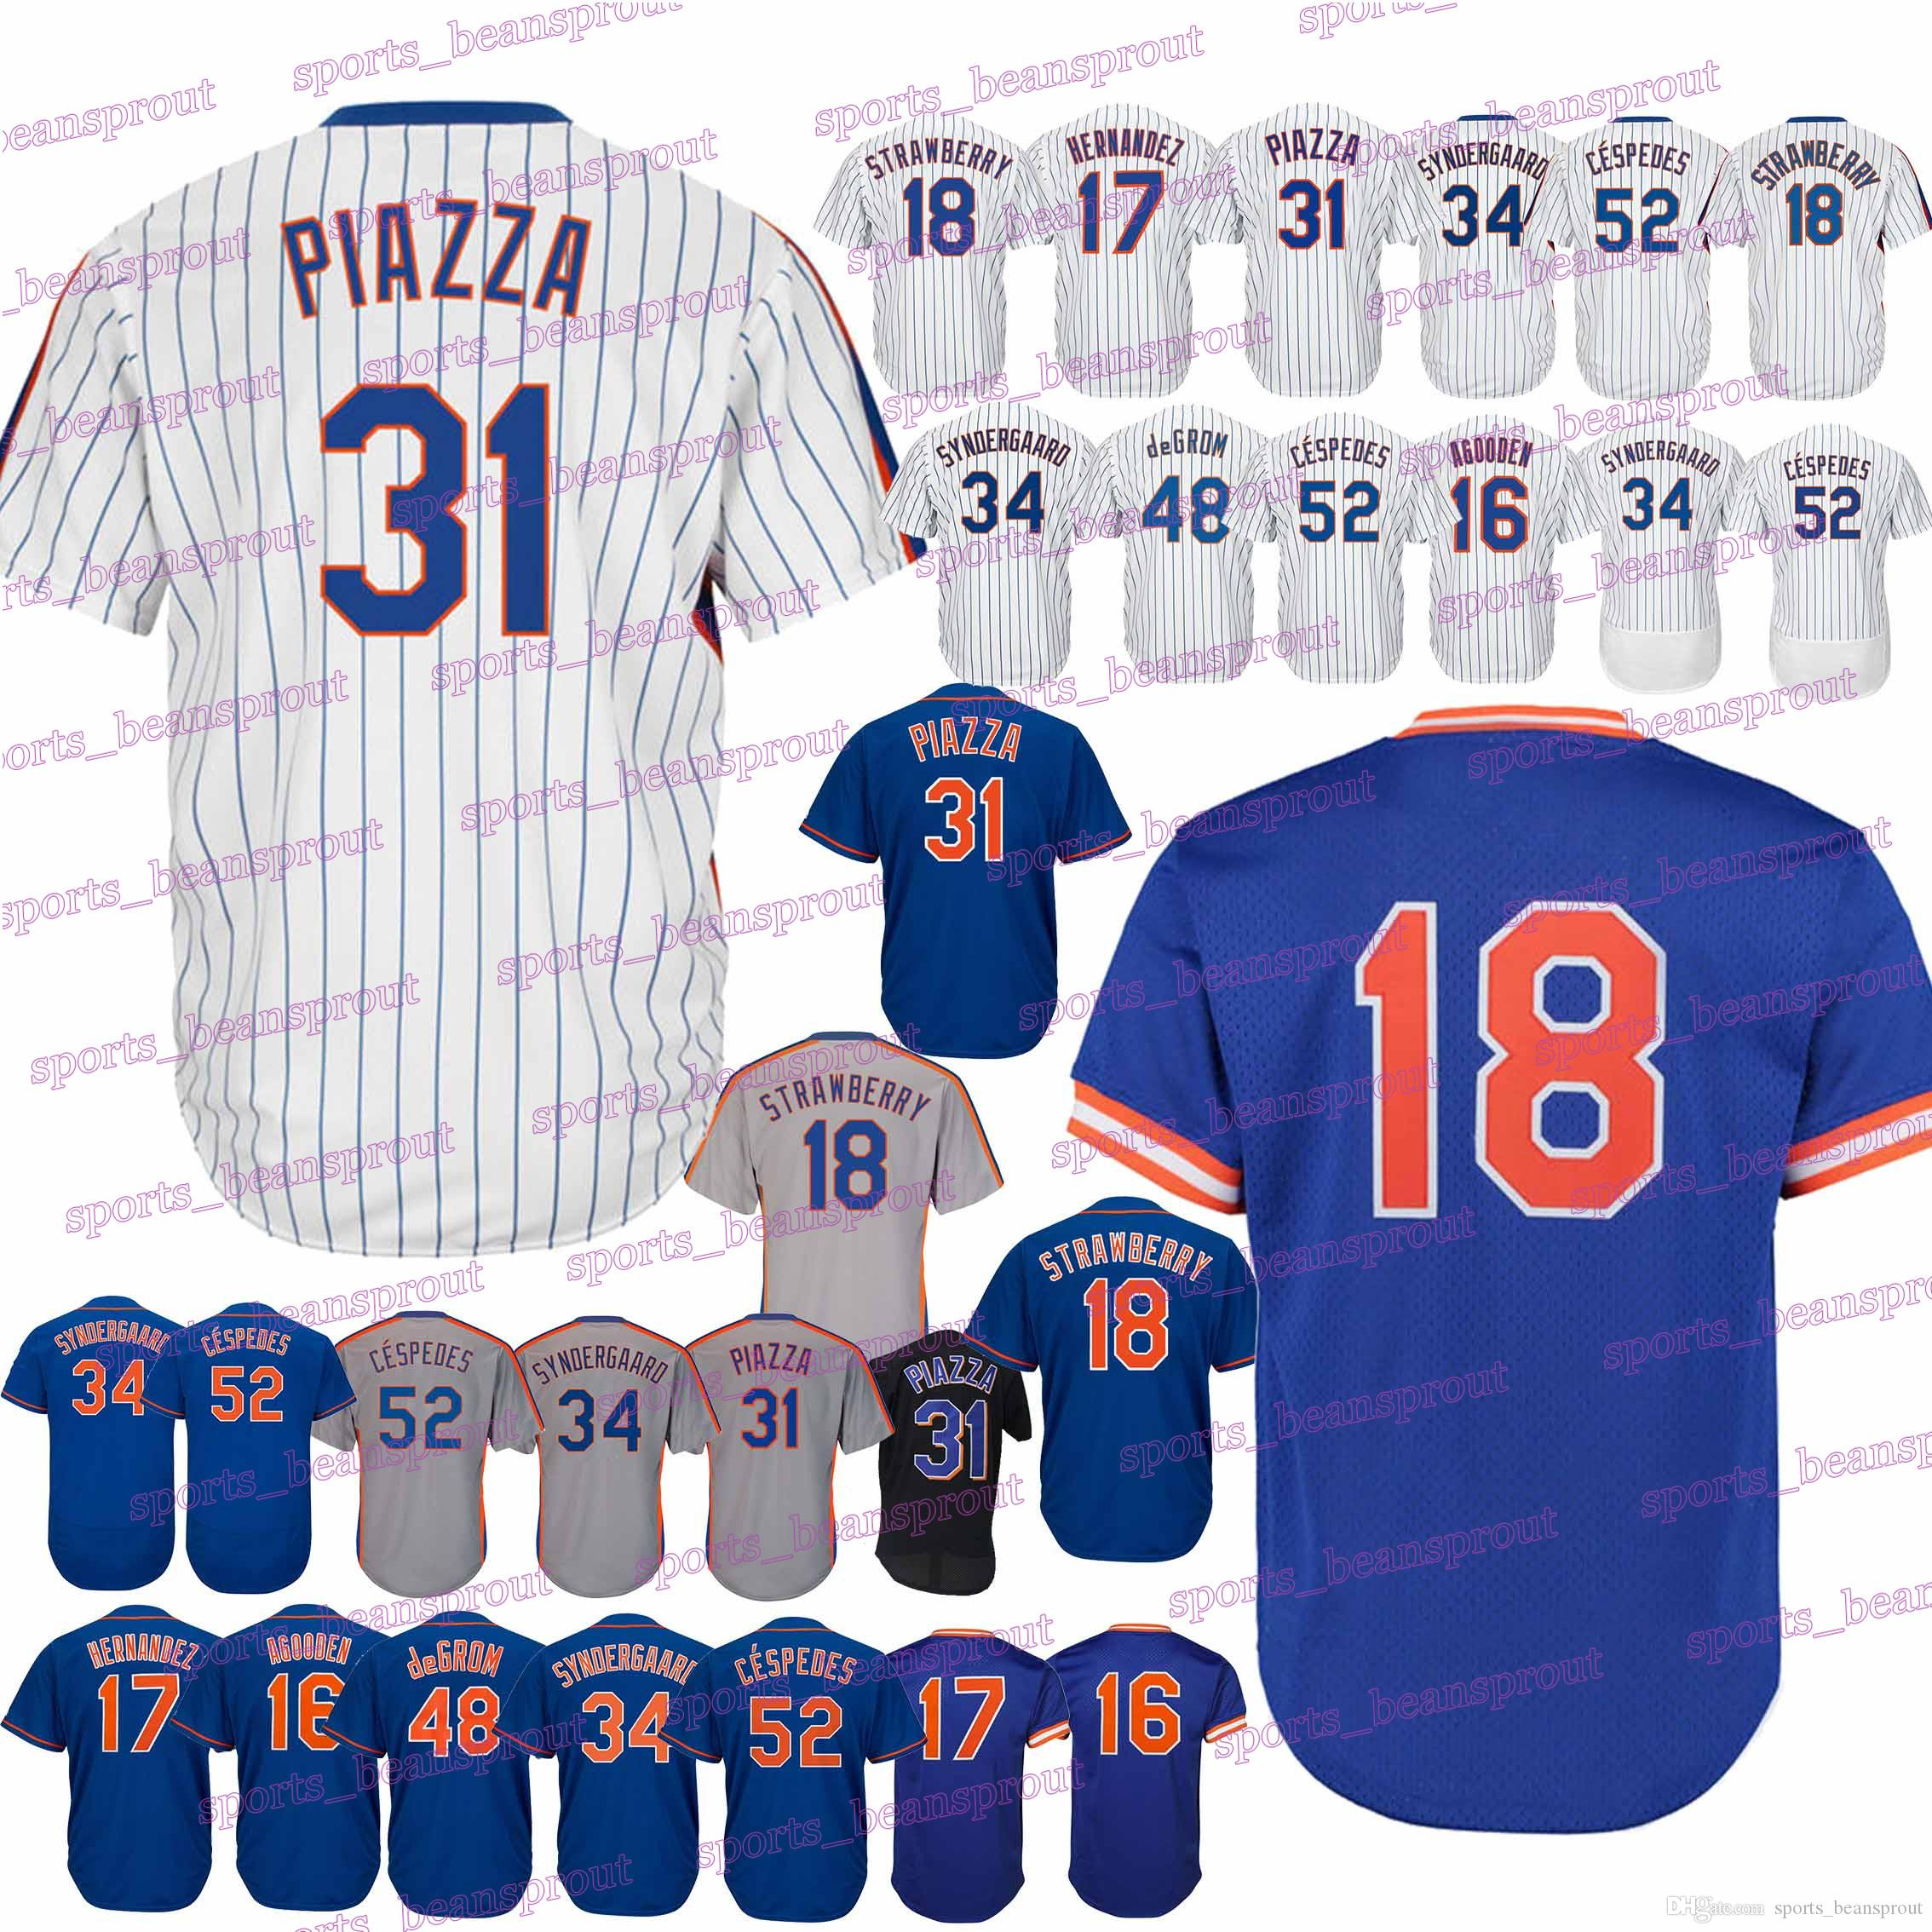 official photos 8b9c4 3632c New York 16 Dwight Gooden Mets Jerseys 17 Keith Hernandez Jersey 18 Darryl  Strawberry Jerseys Baseball Jerseys